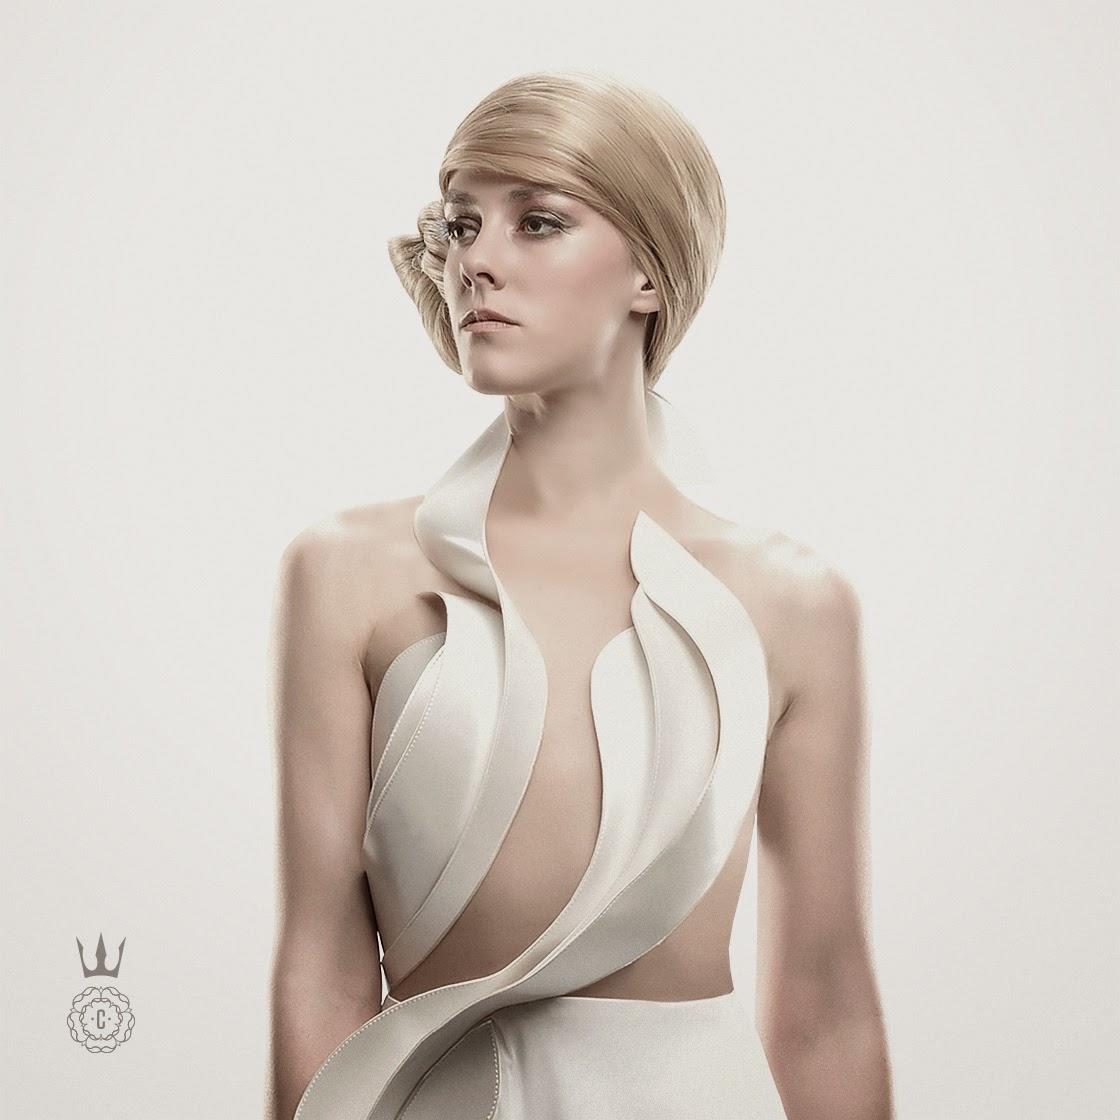 Hijacked Peeta and Johanna in New Capitol Couture ...